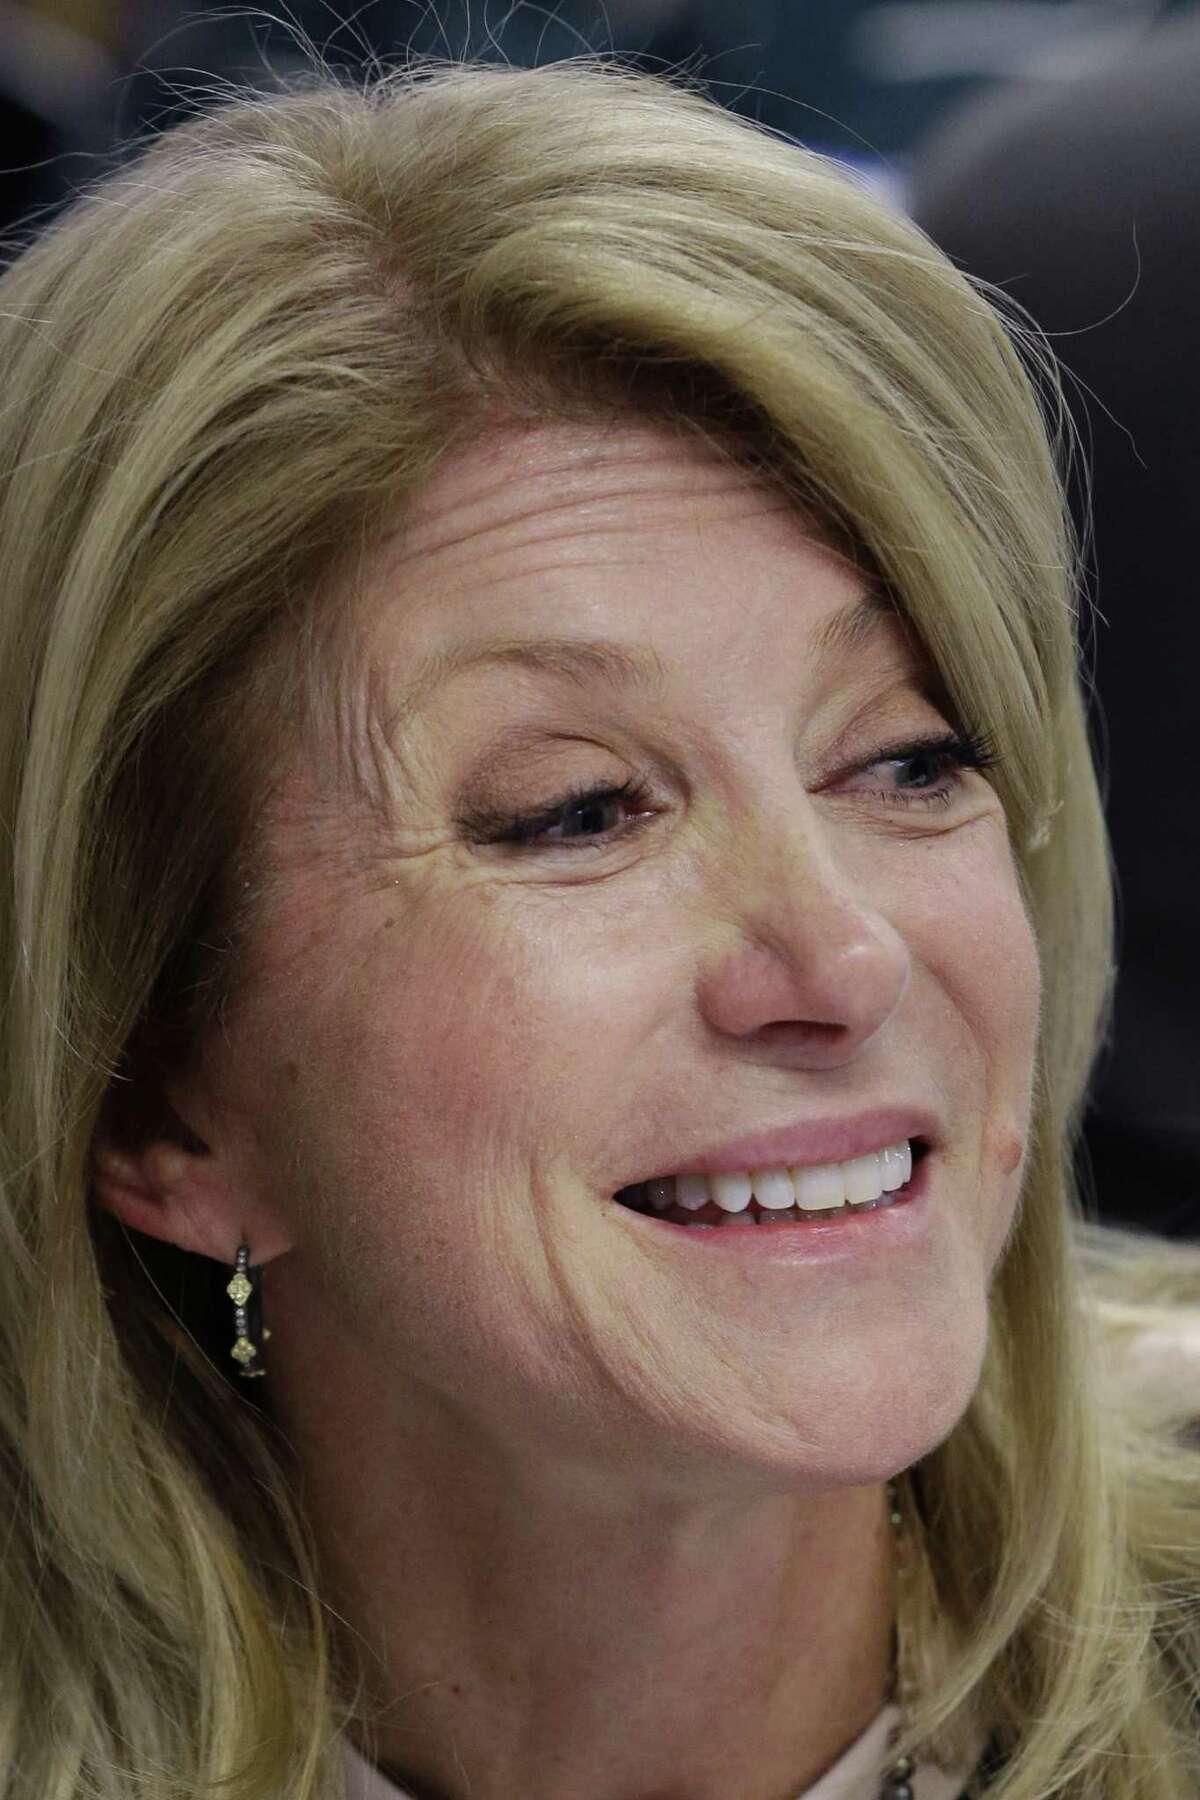 Texas State Sen. Wendy Davis' campaign team remains hopeful.